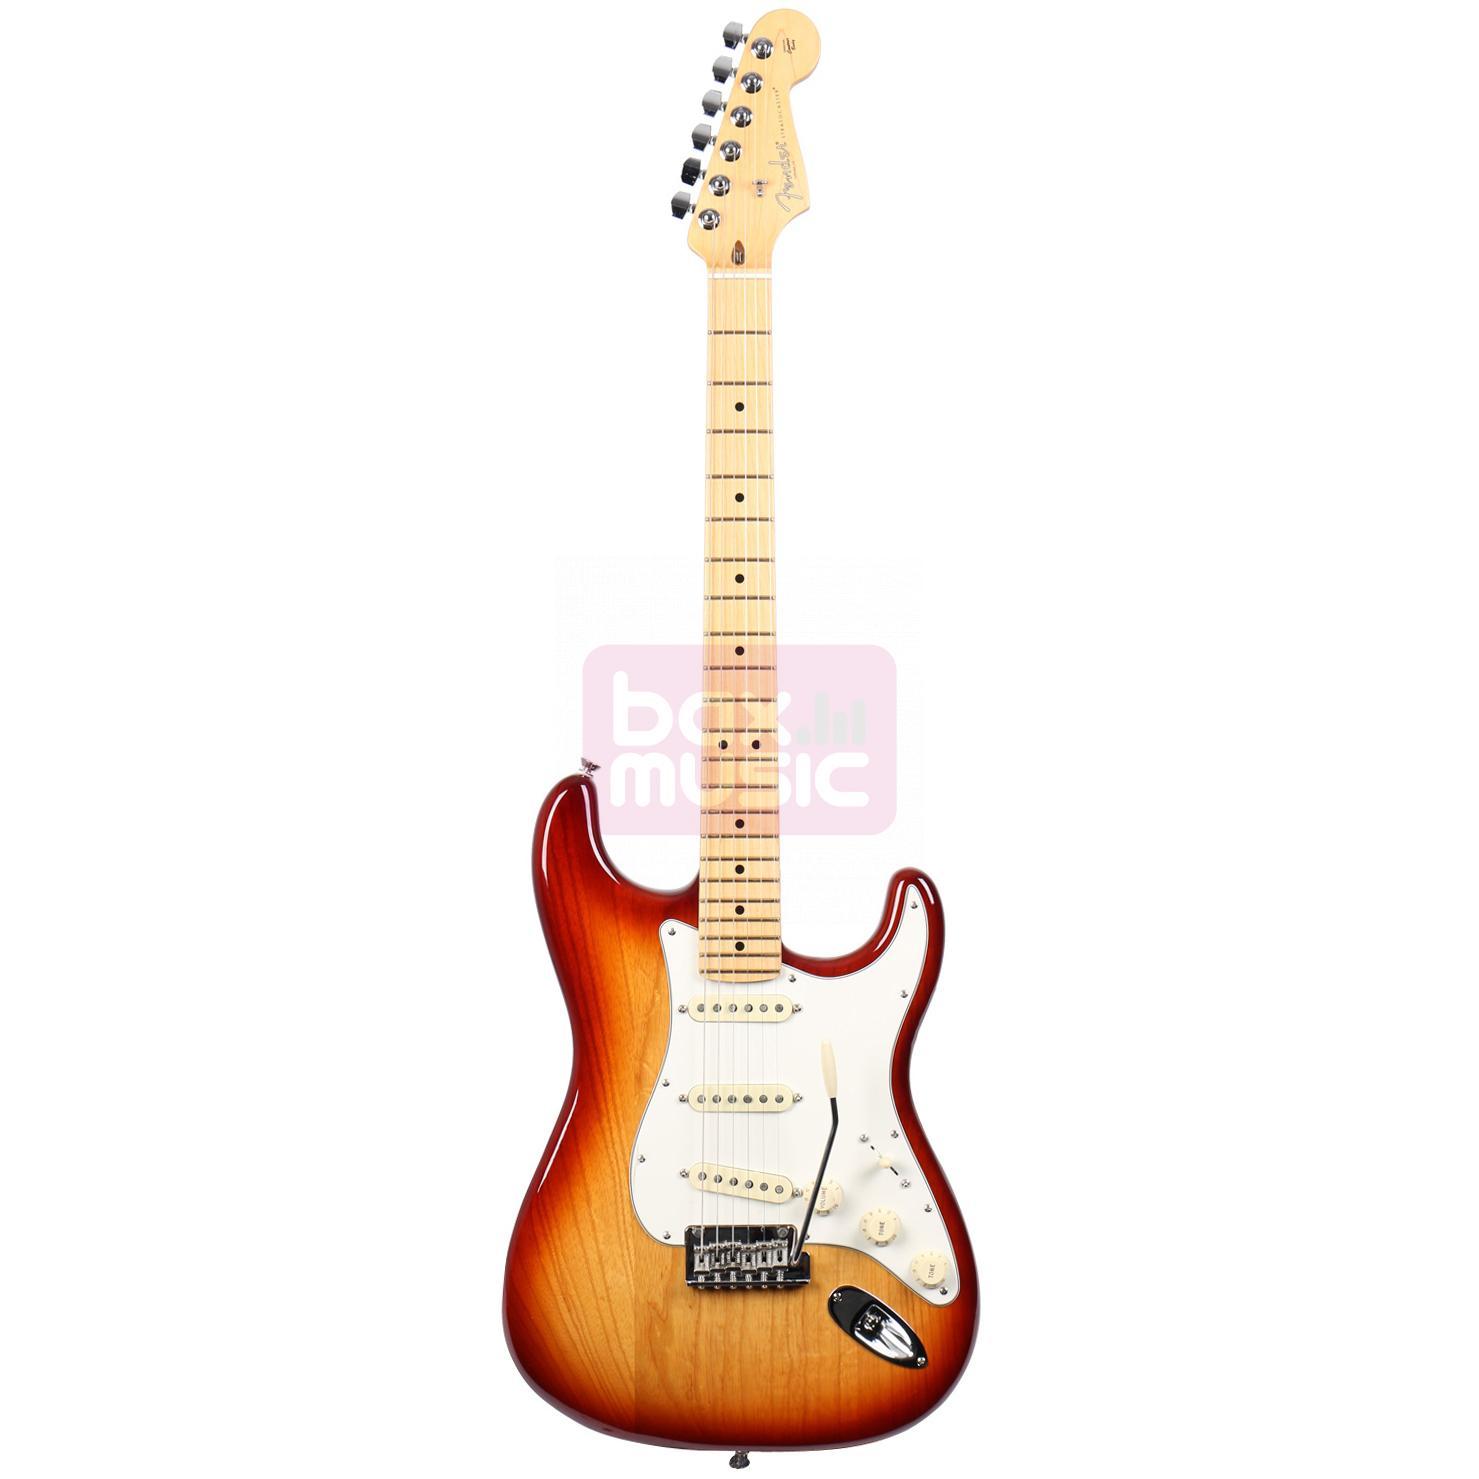 Fender American Professional Stratocaster Sienna Sunburst MN